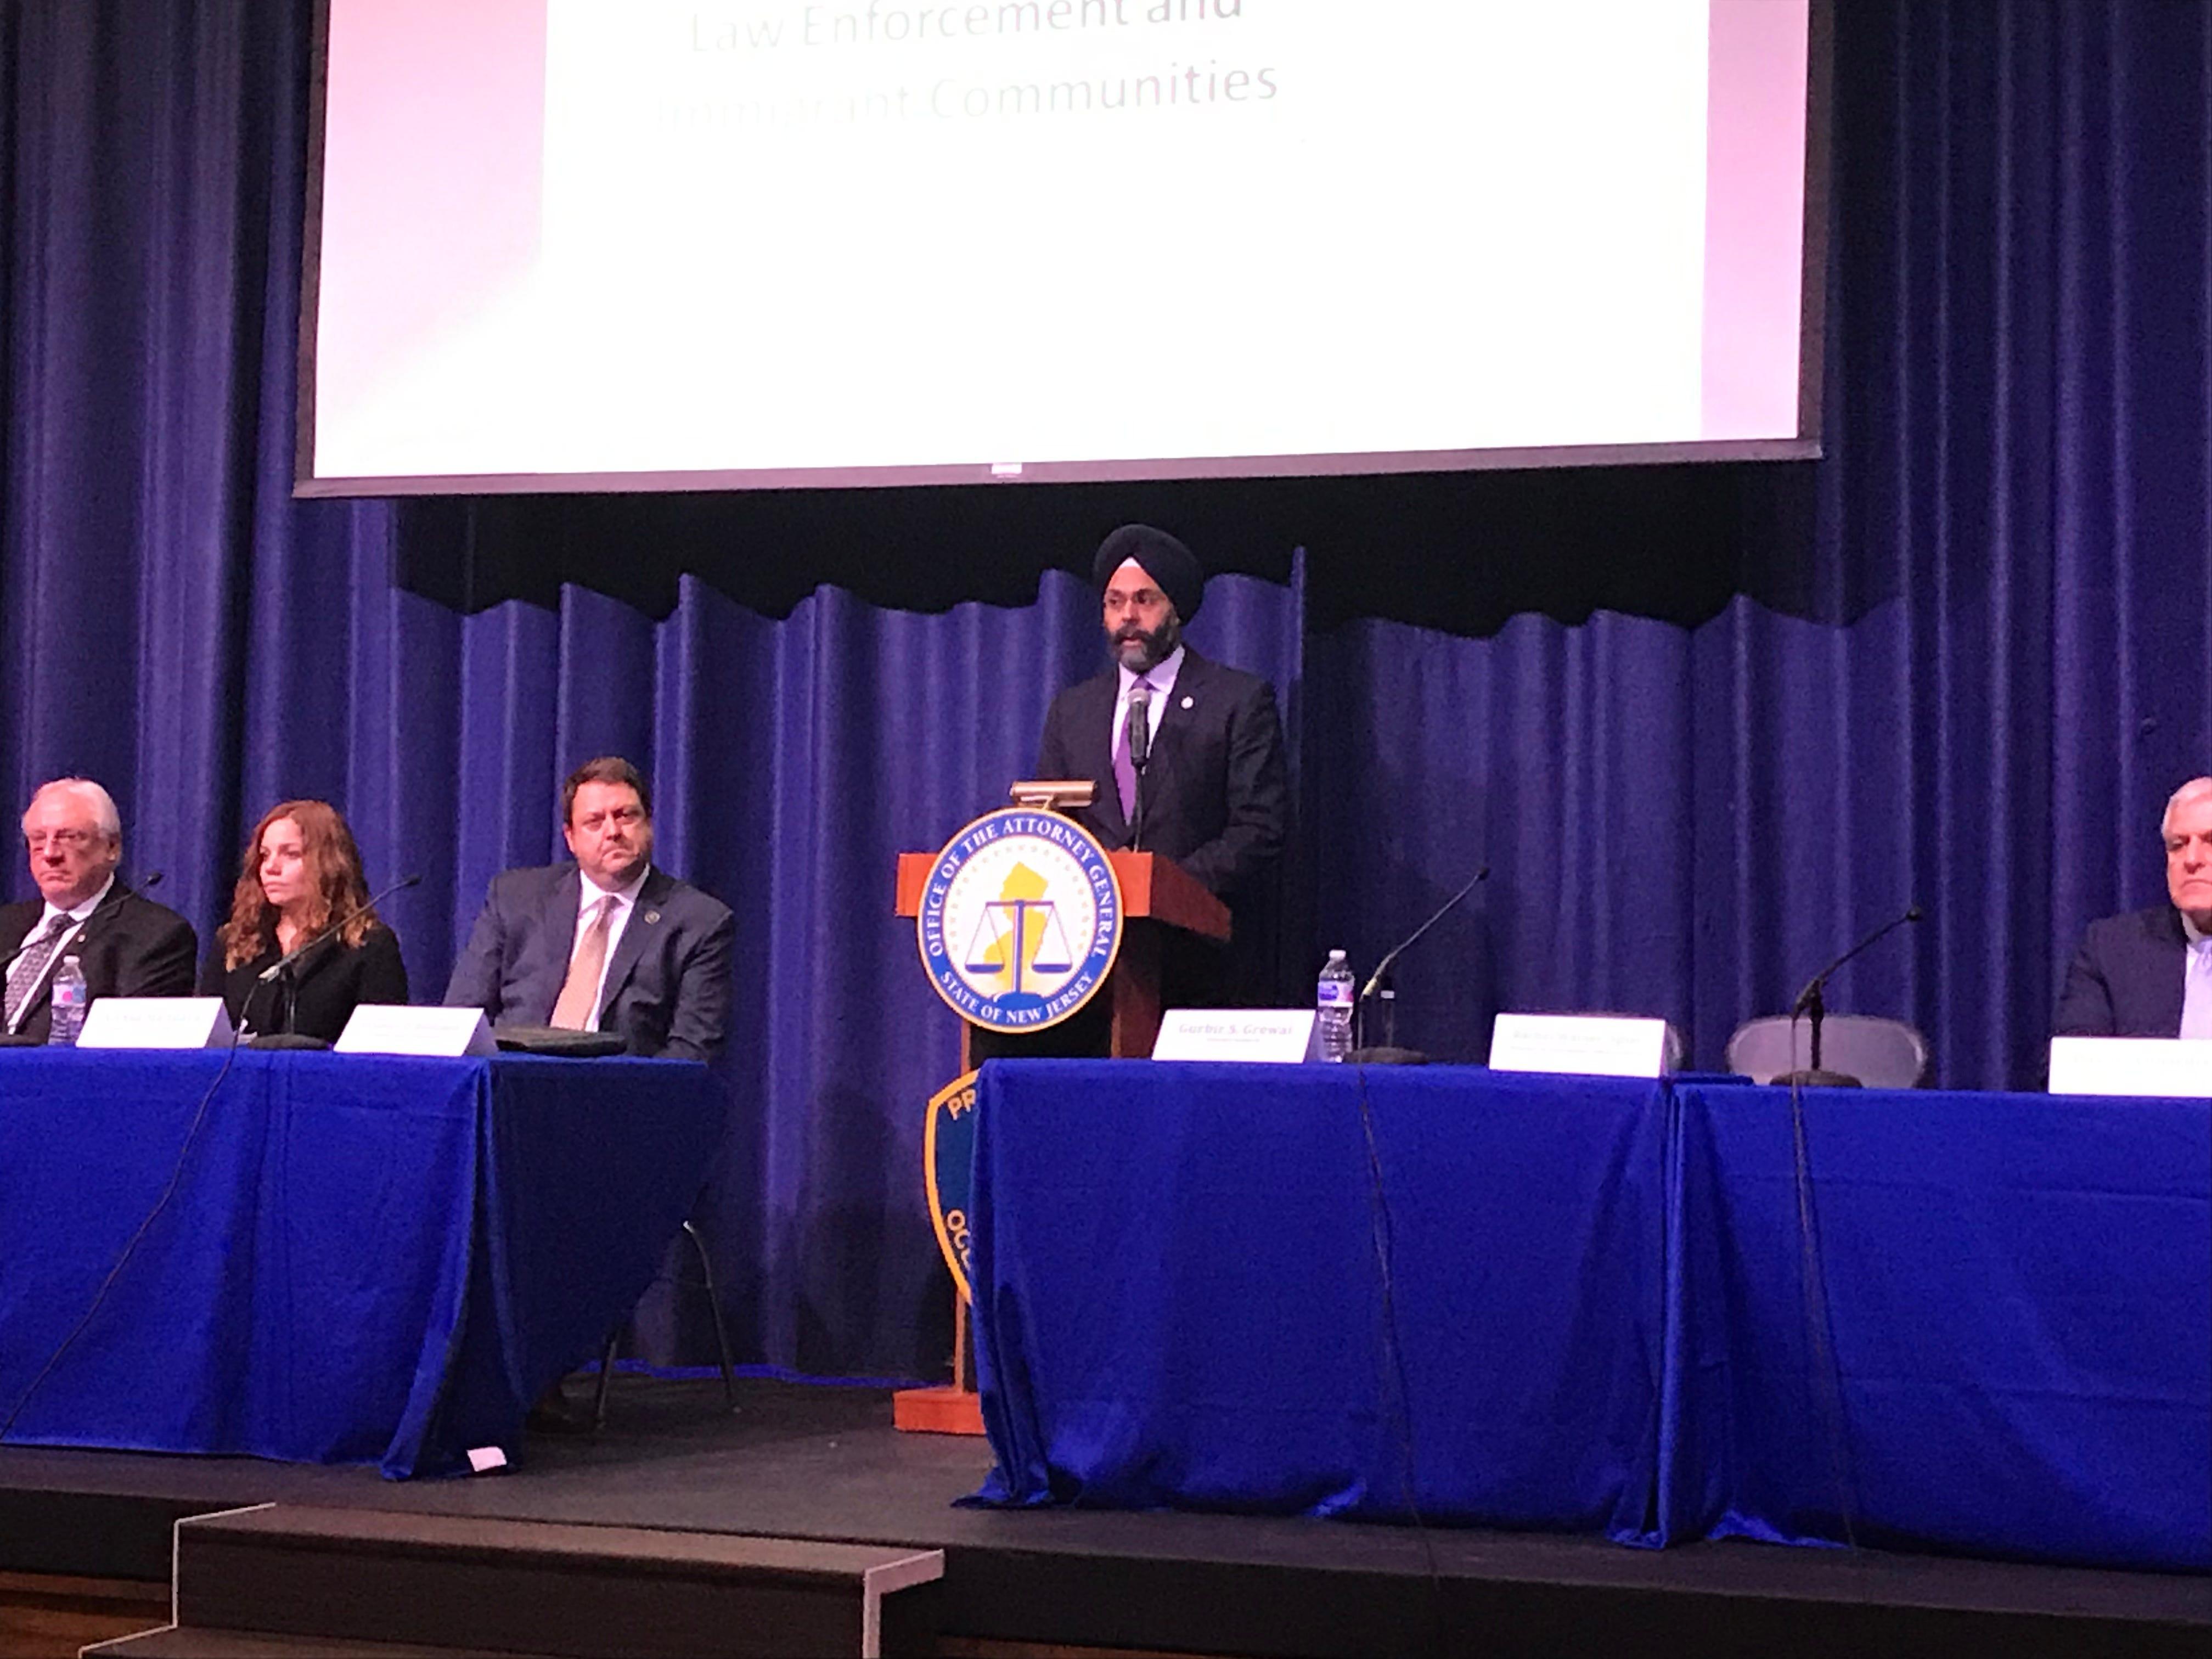 Attorney General Gurbir Grewal and Ocean County Prosecutor Bradley Billhimer hosted a town hall meeting March 5 at Lakewood High School.